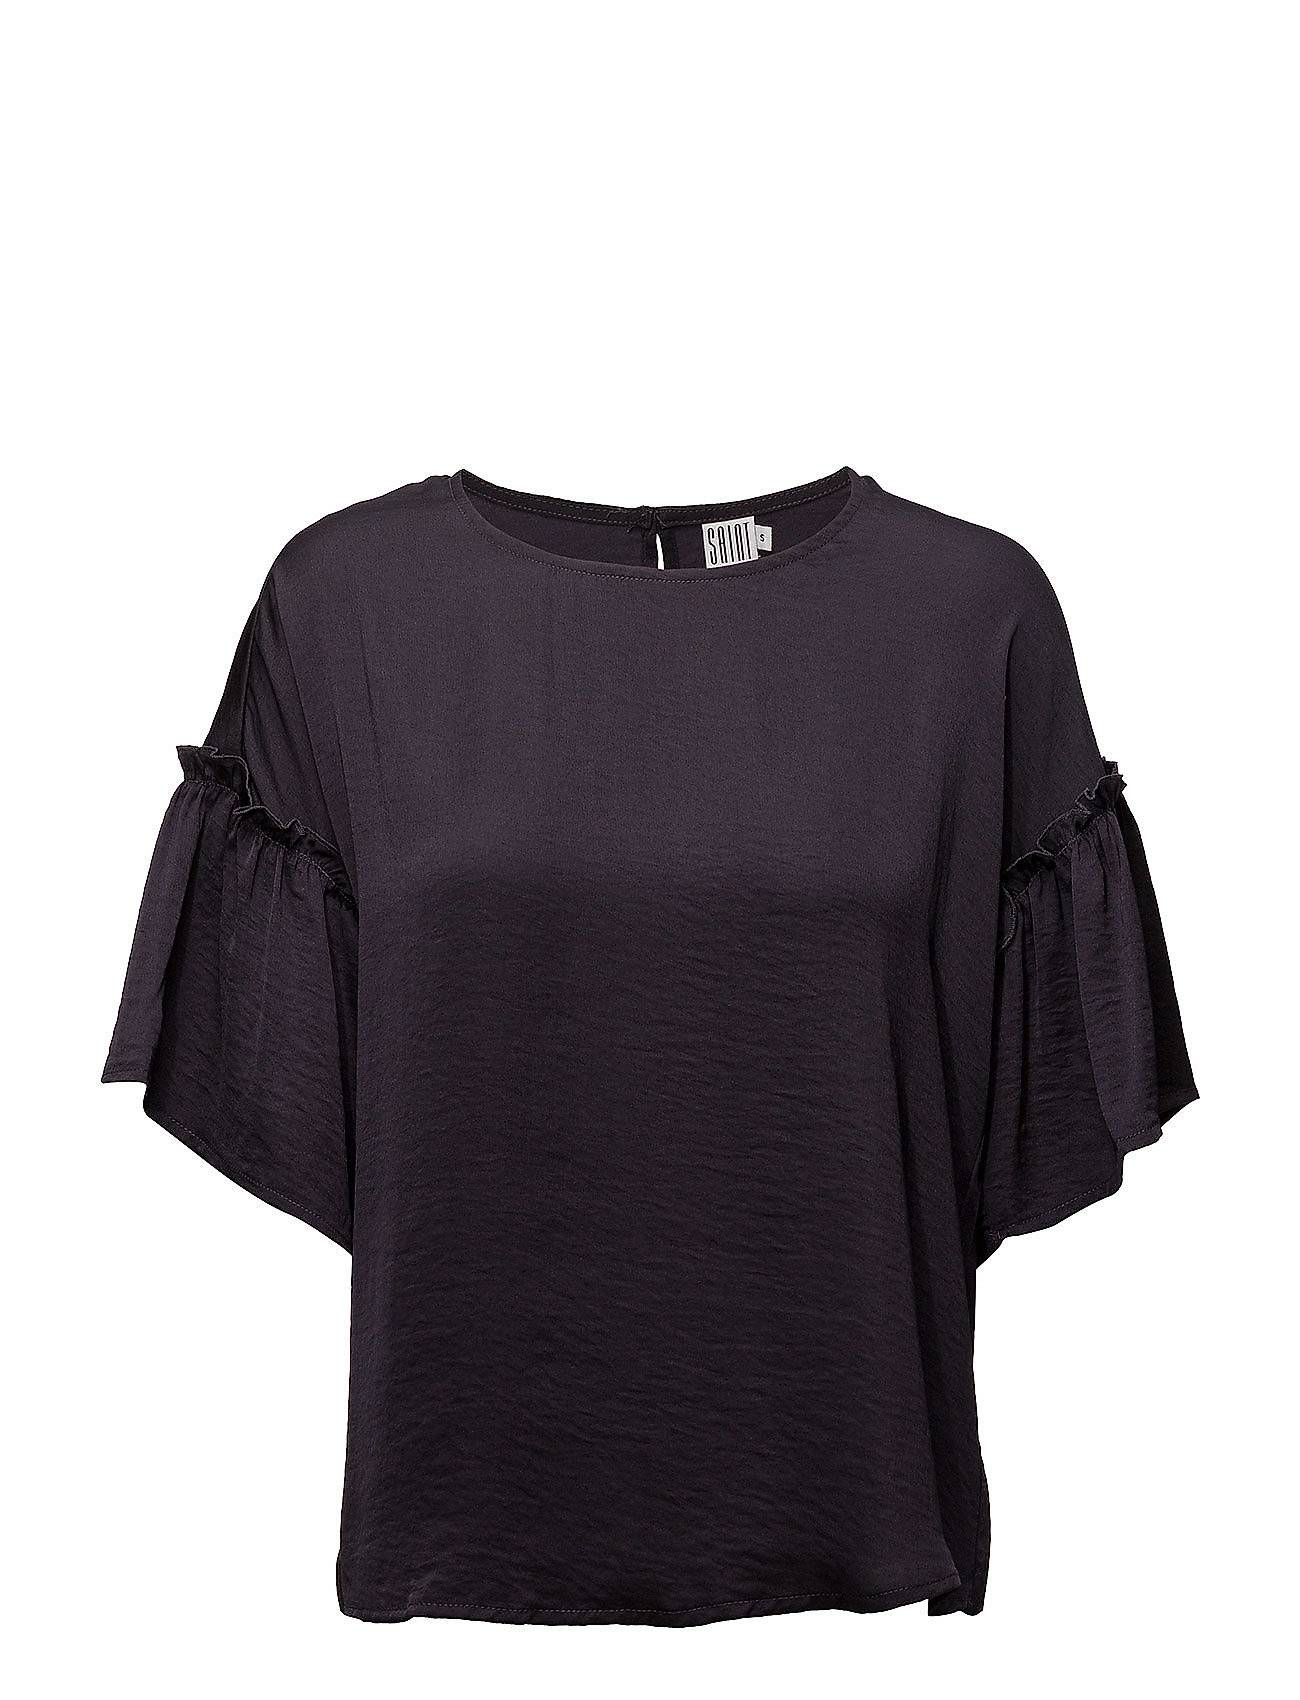 Saint Tropez Blouse With Ruffle Sleeve Blouses Short-sleeved Musta Saint Tropez